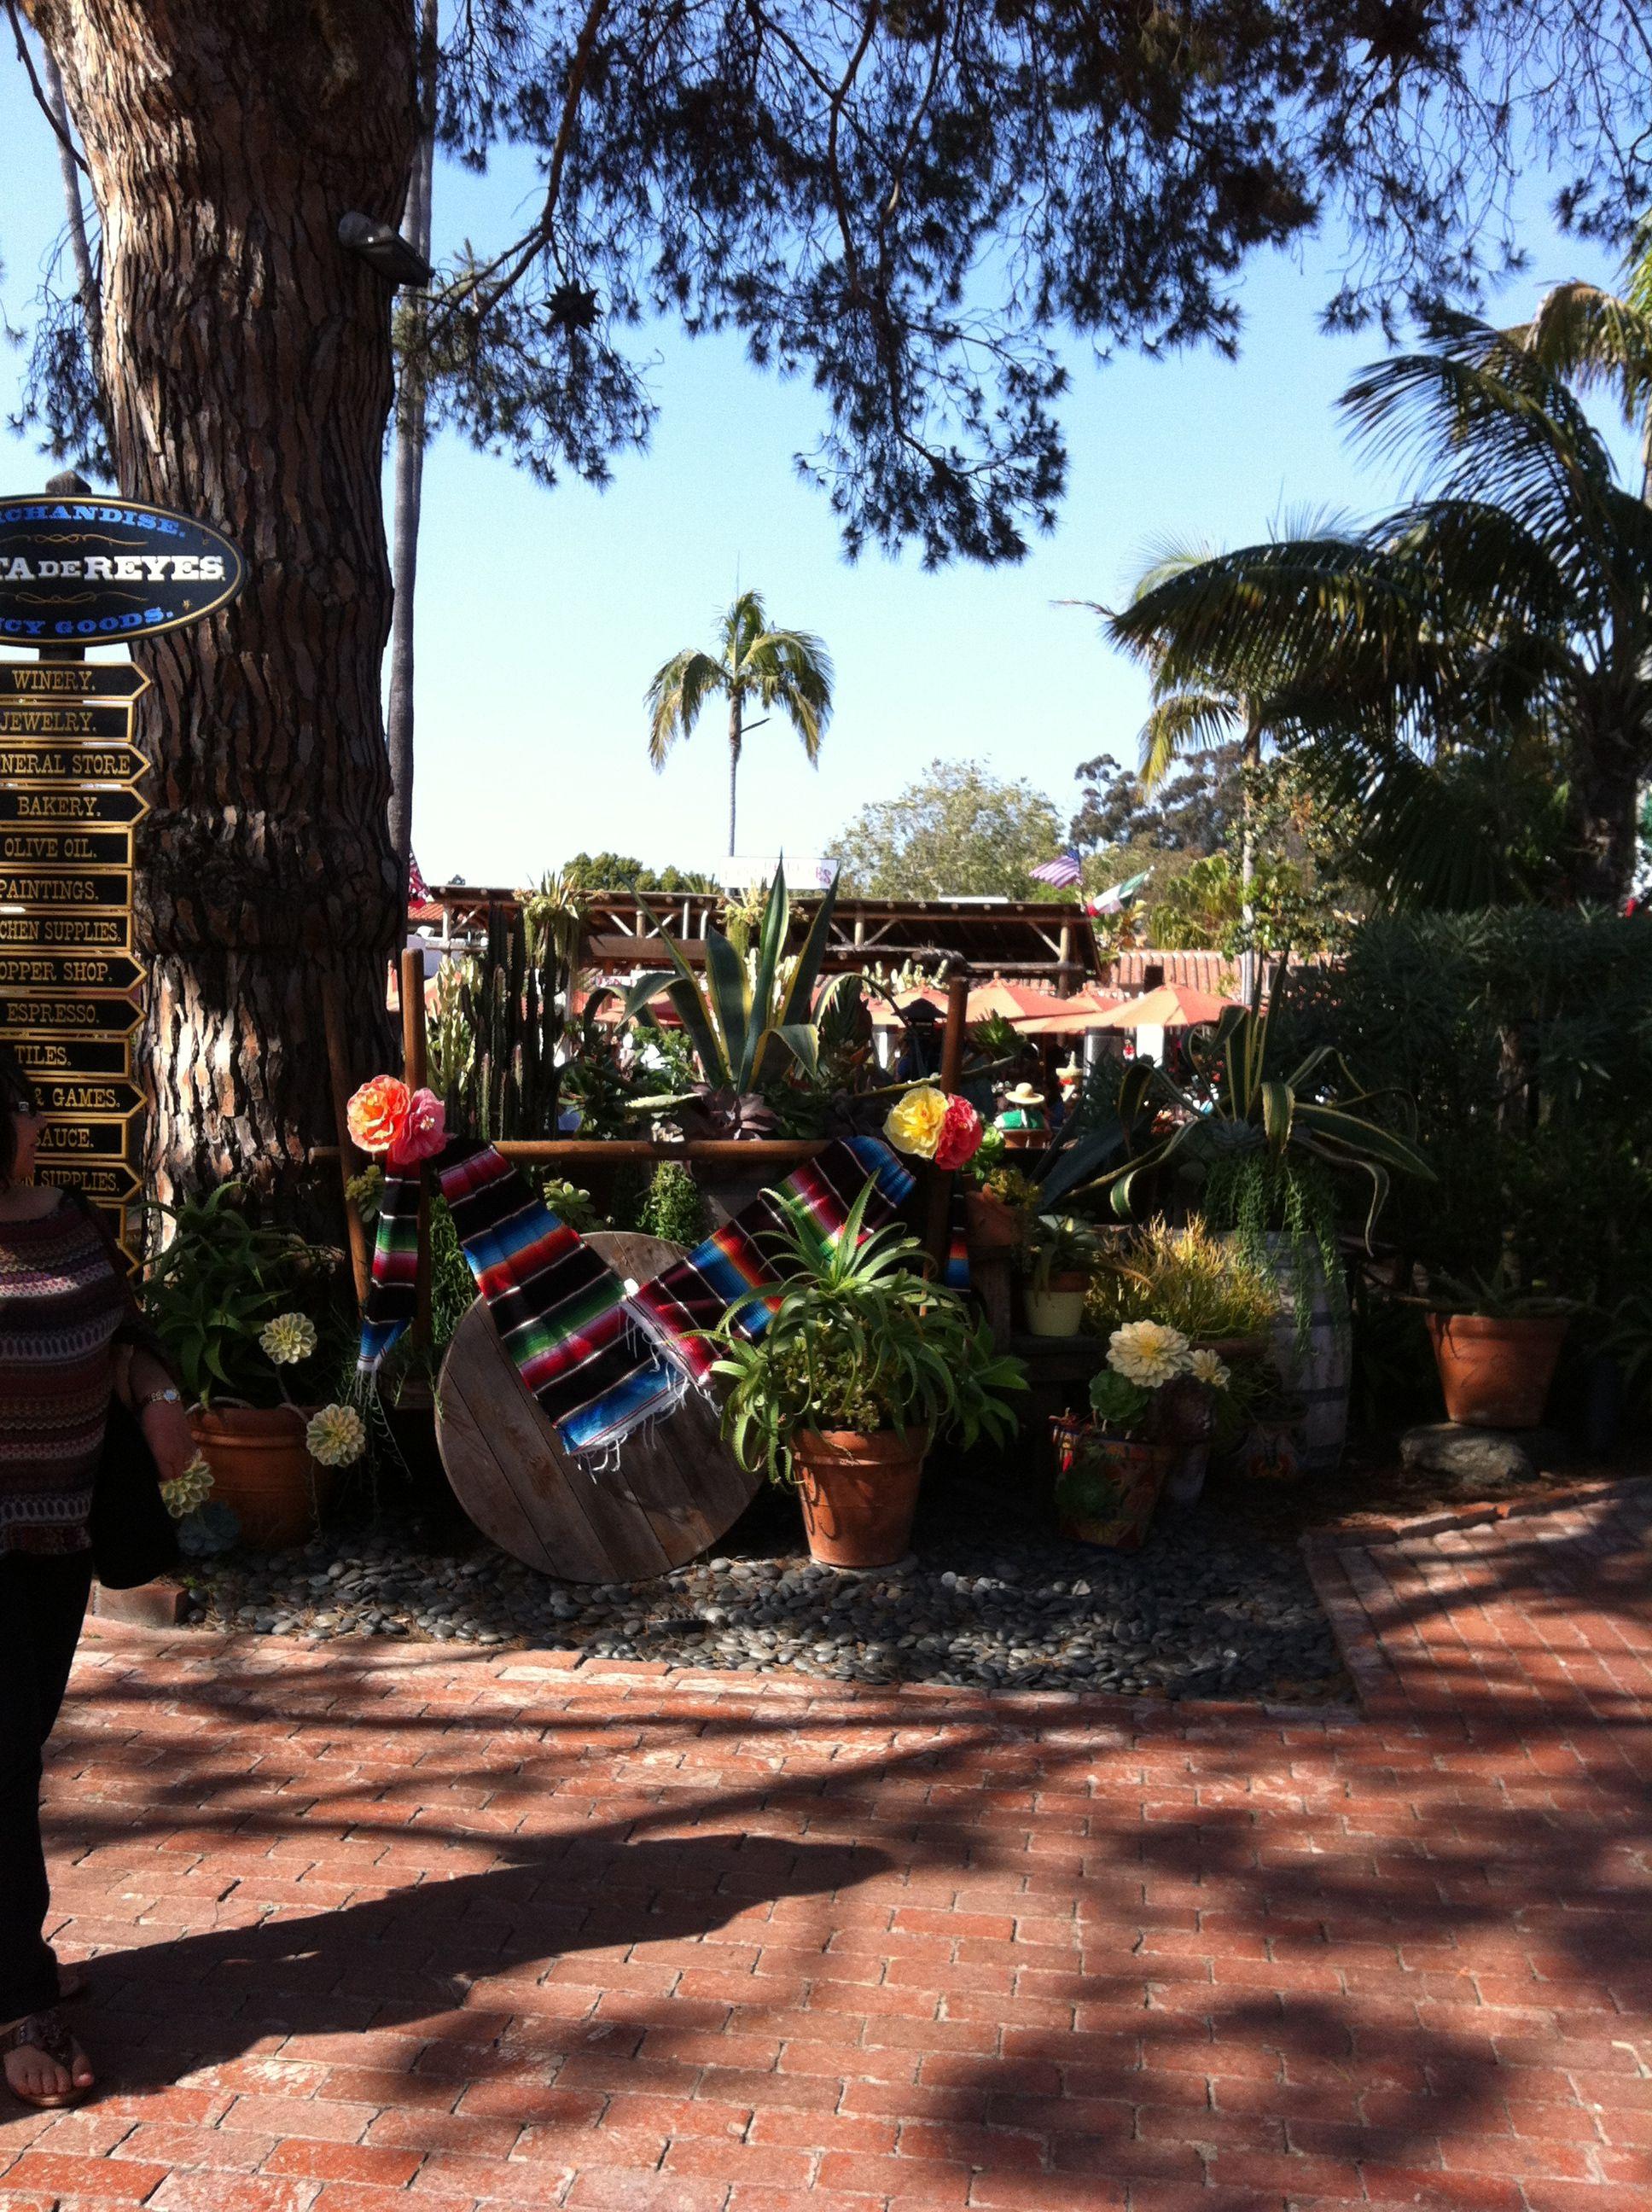 old town san deigo ca | favorite places & spaces | pinterest | san